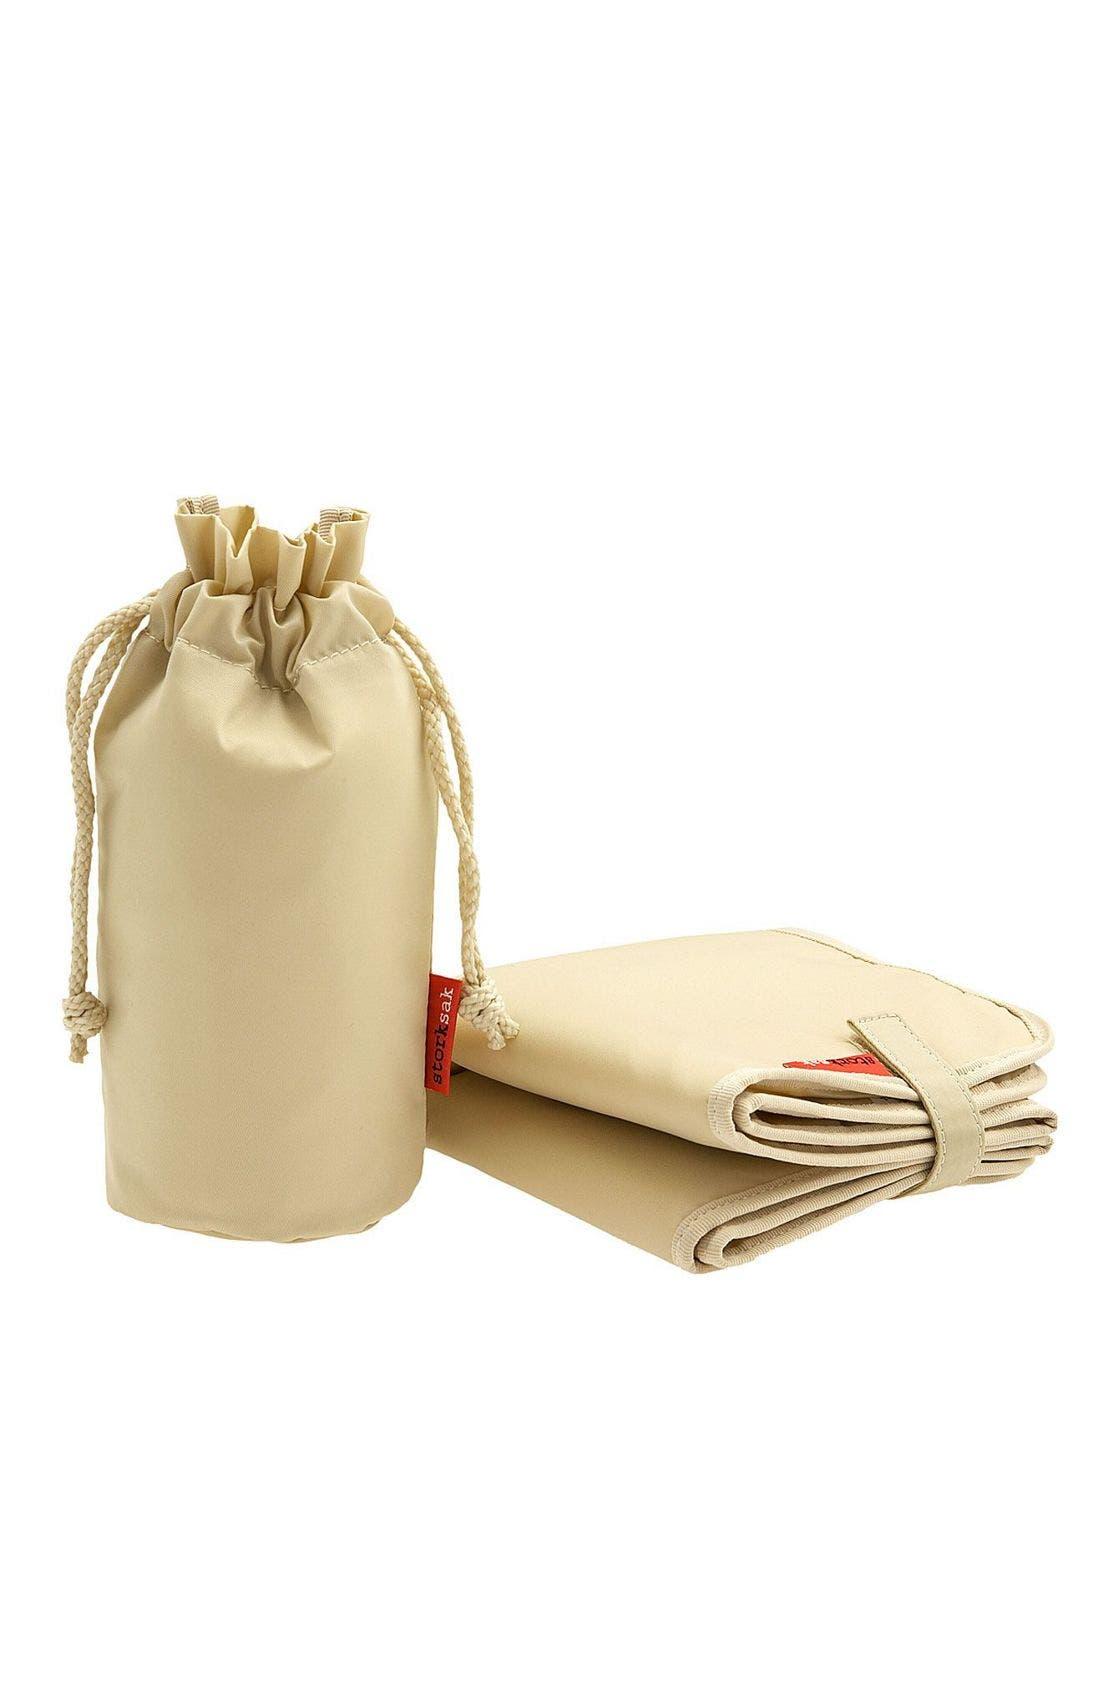 Alternate Image 4  - Storksak Elizabeth Leather Diaper Tote